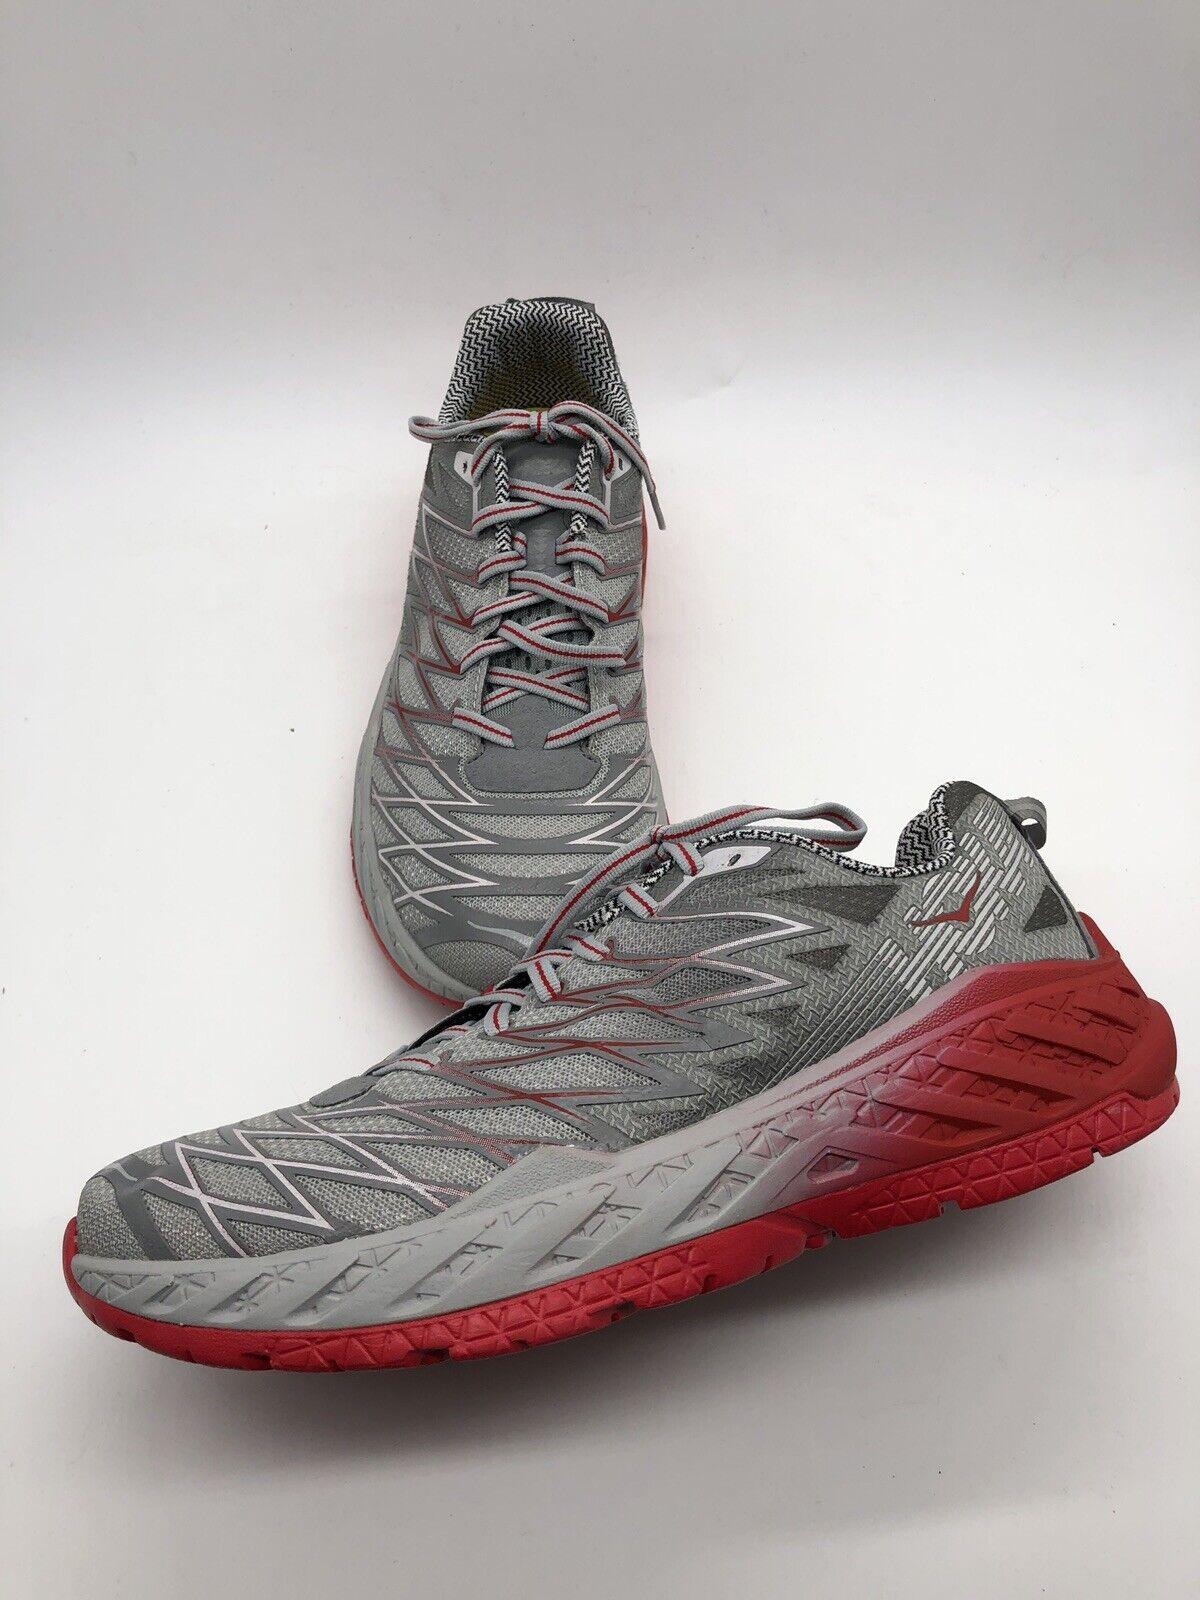 Hoka One Clayton 2 grisscale Running zapatos One para hombres 9 Nuevo Sin Caja B10